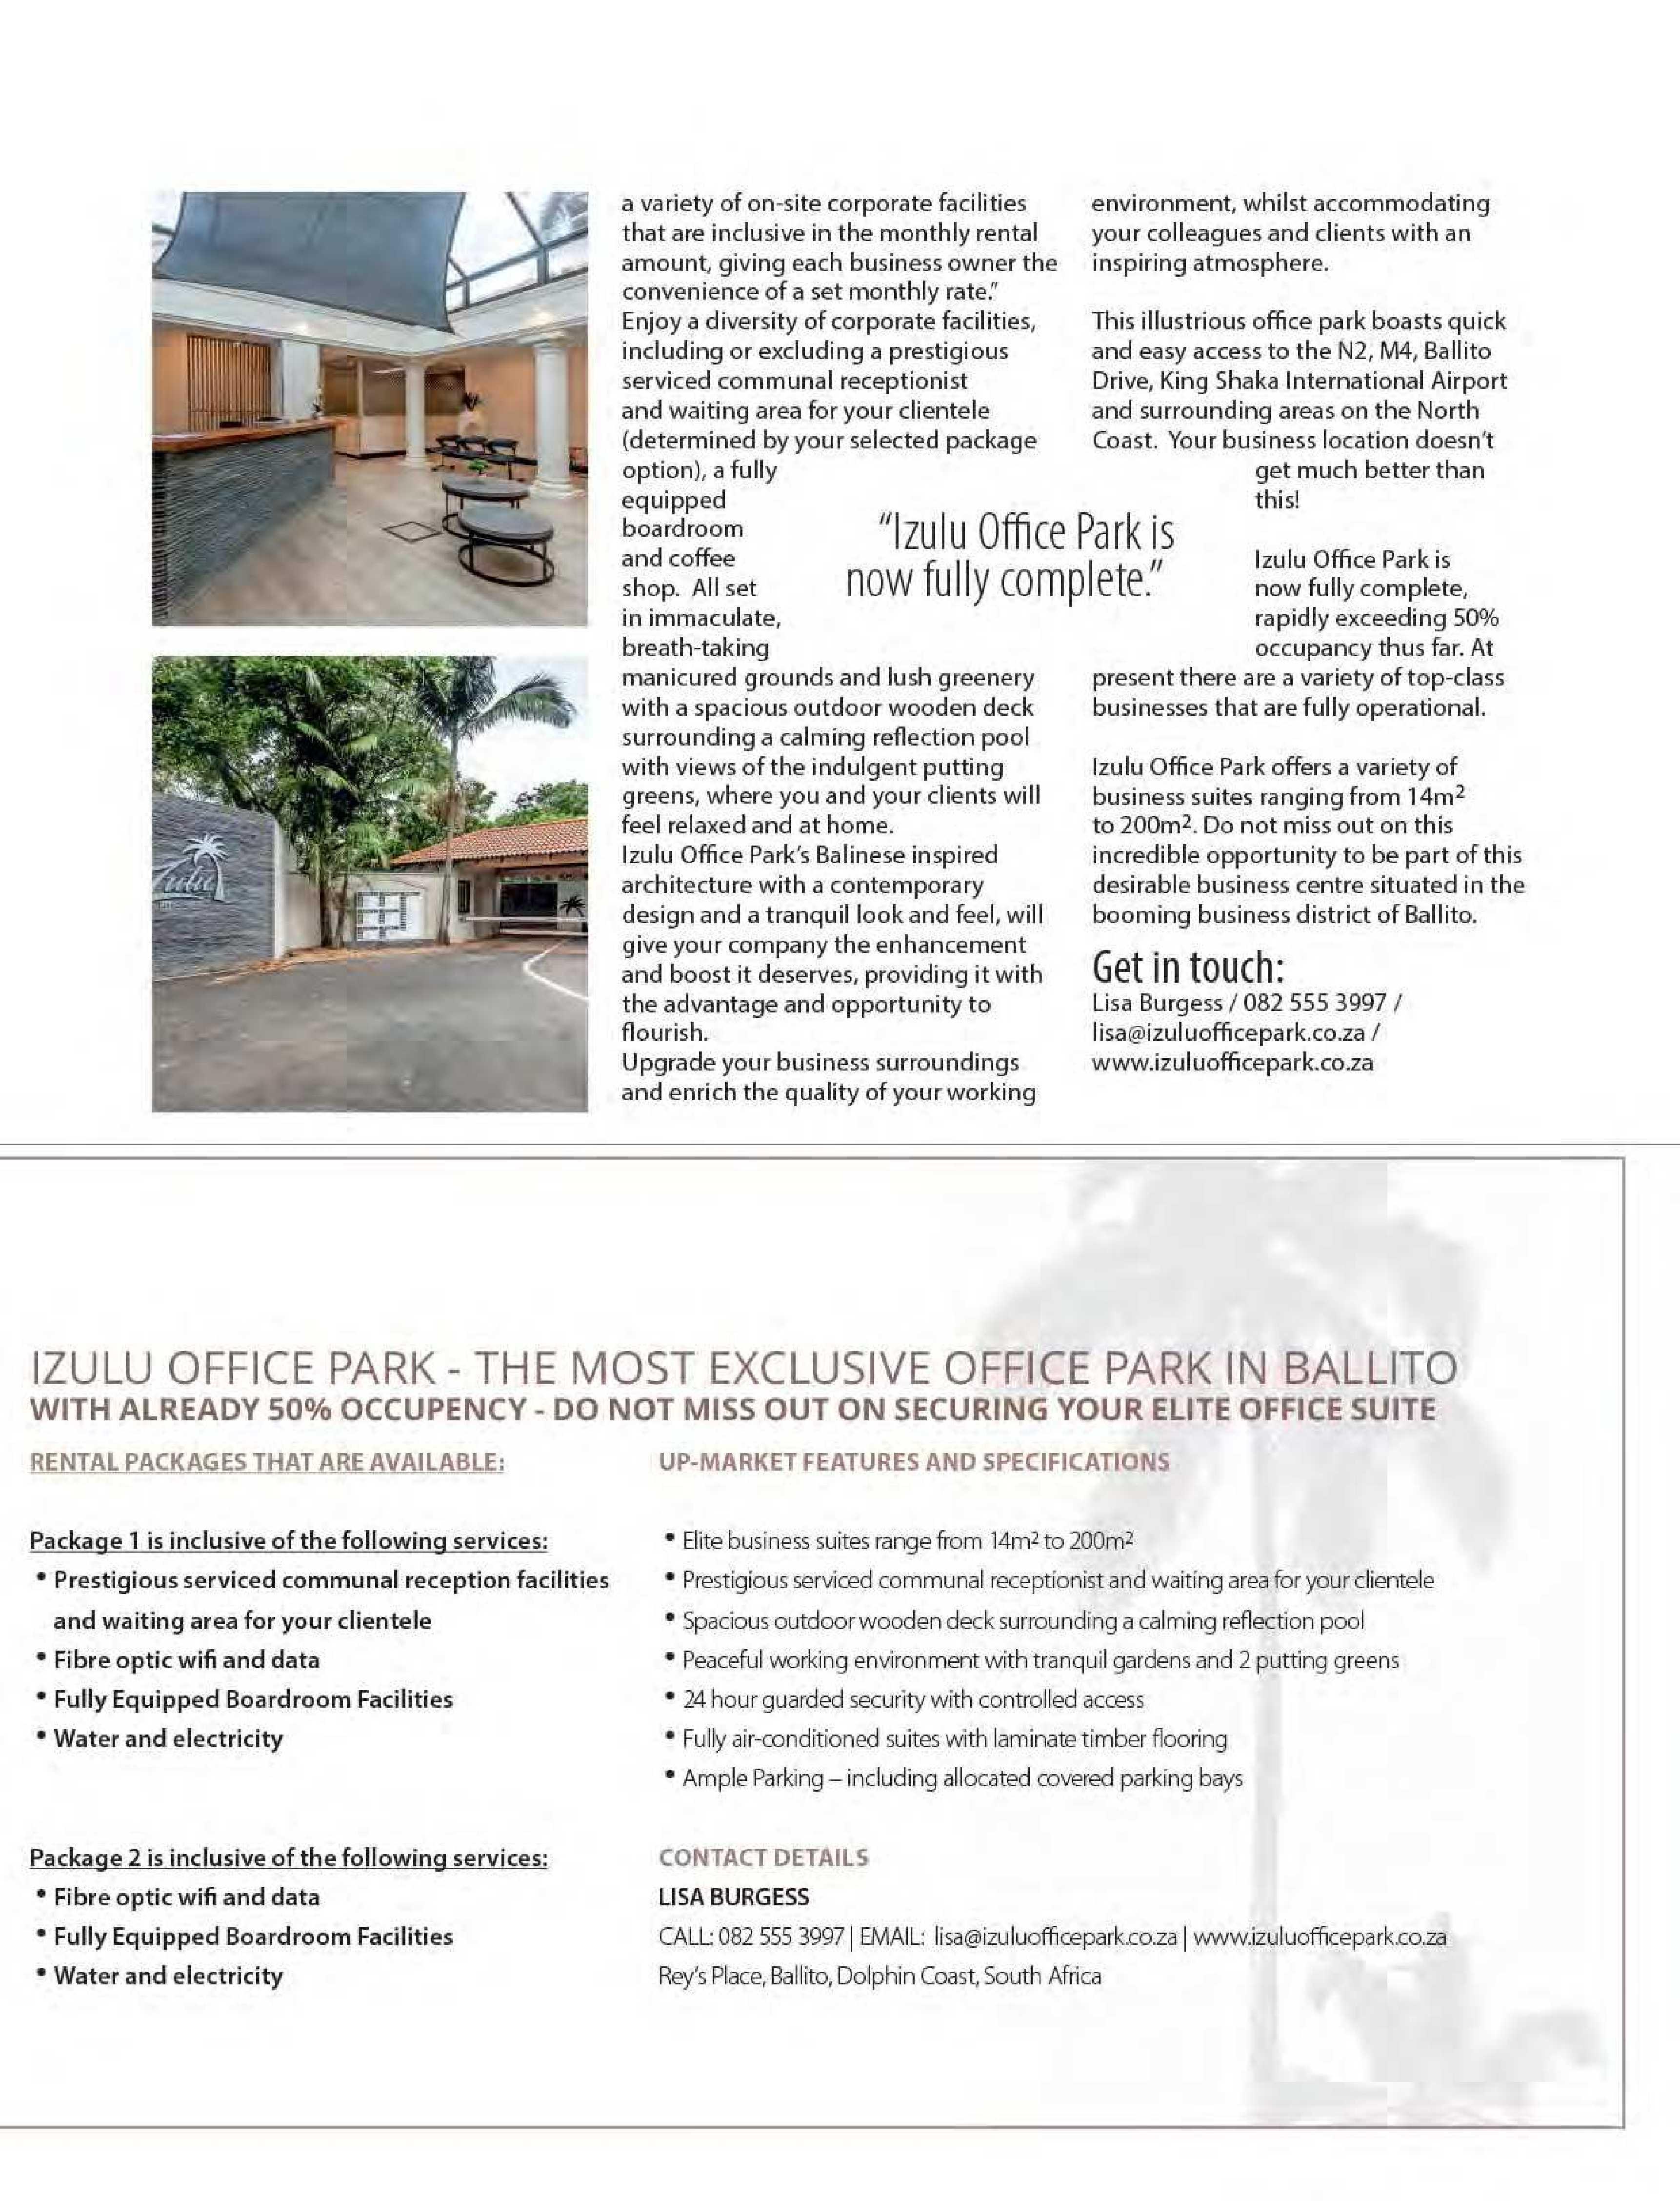 get-magazine-ballitoumhlanga-december-2017-january-2018-2-epapers-page-27